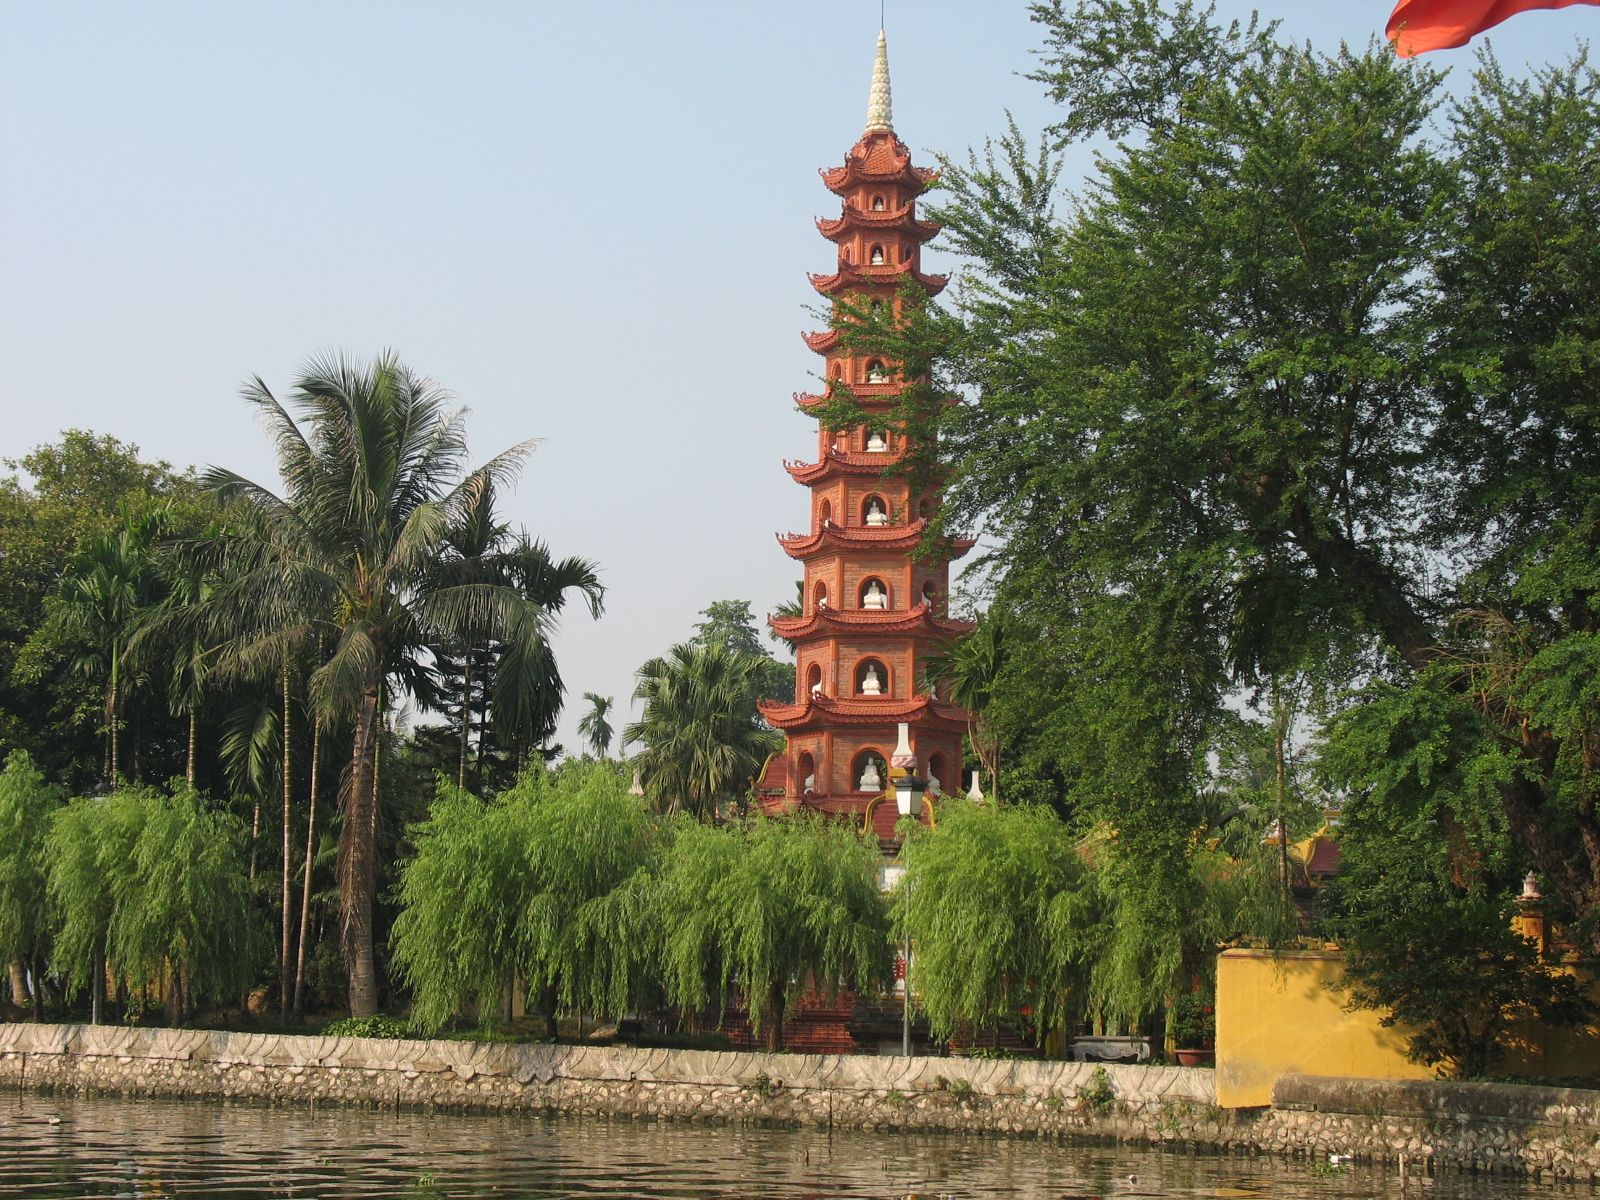 Voyage nord Vietnam hors es sentiers battus Hanoi